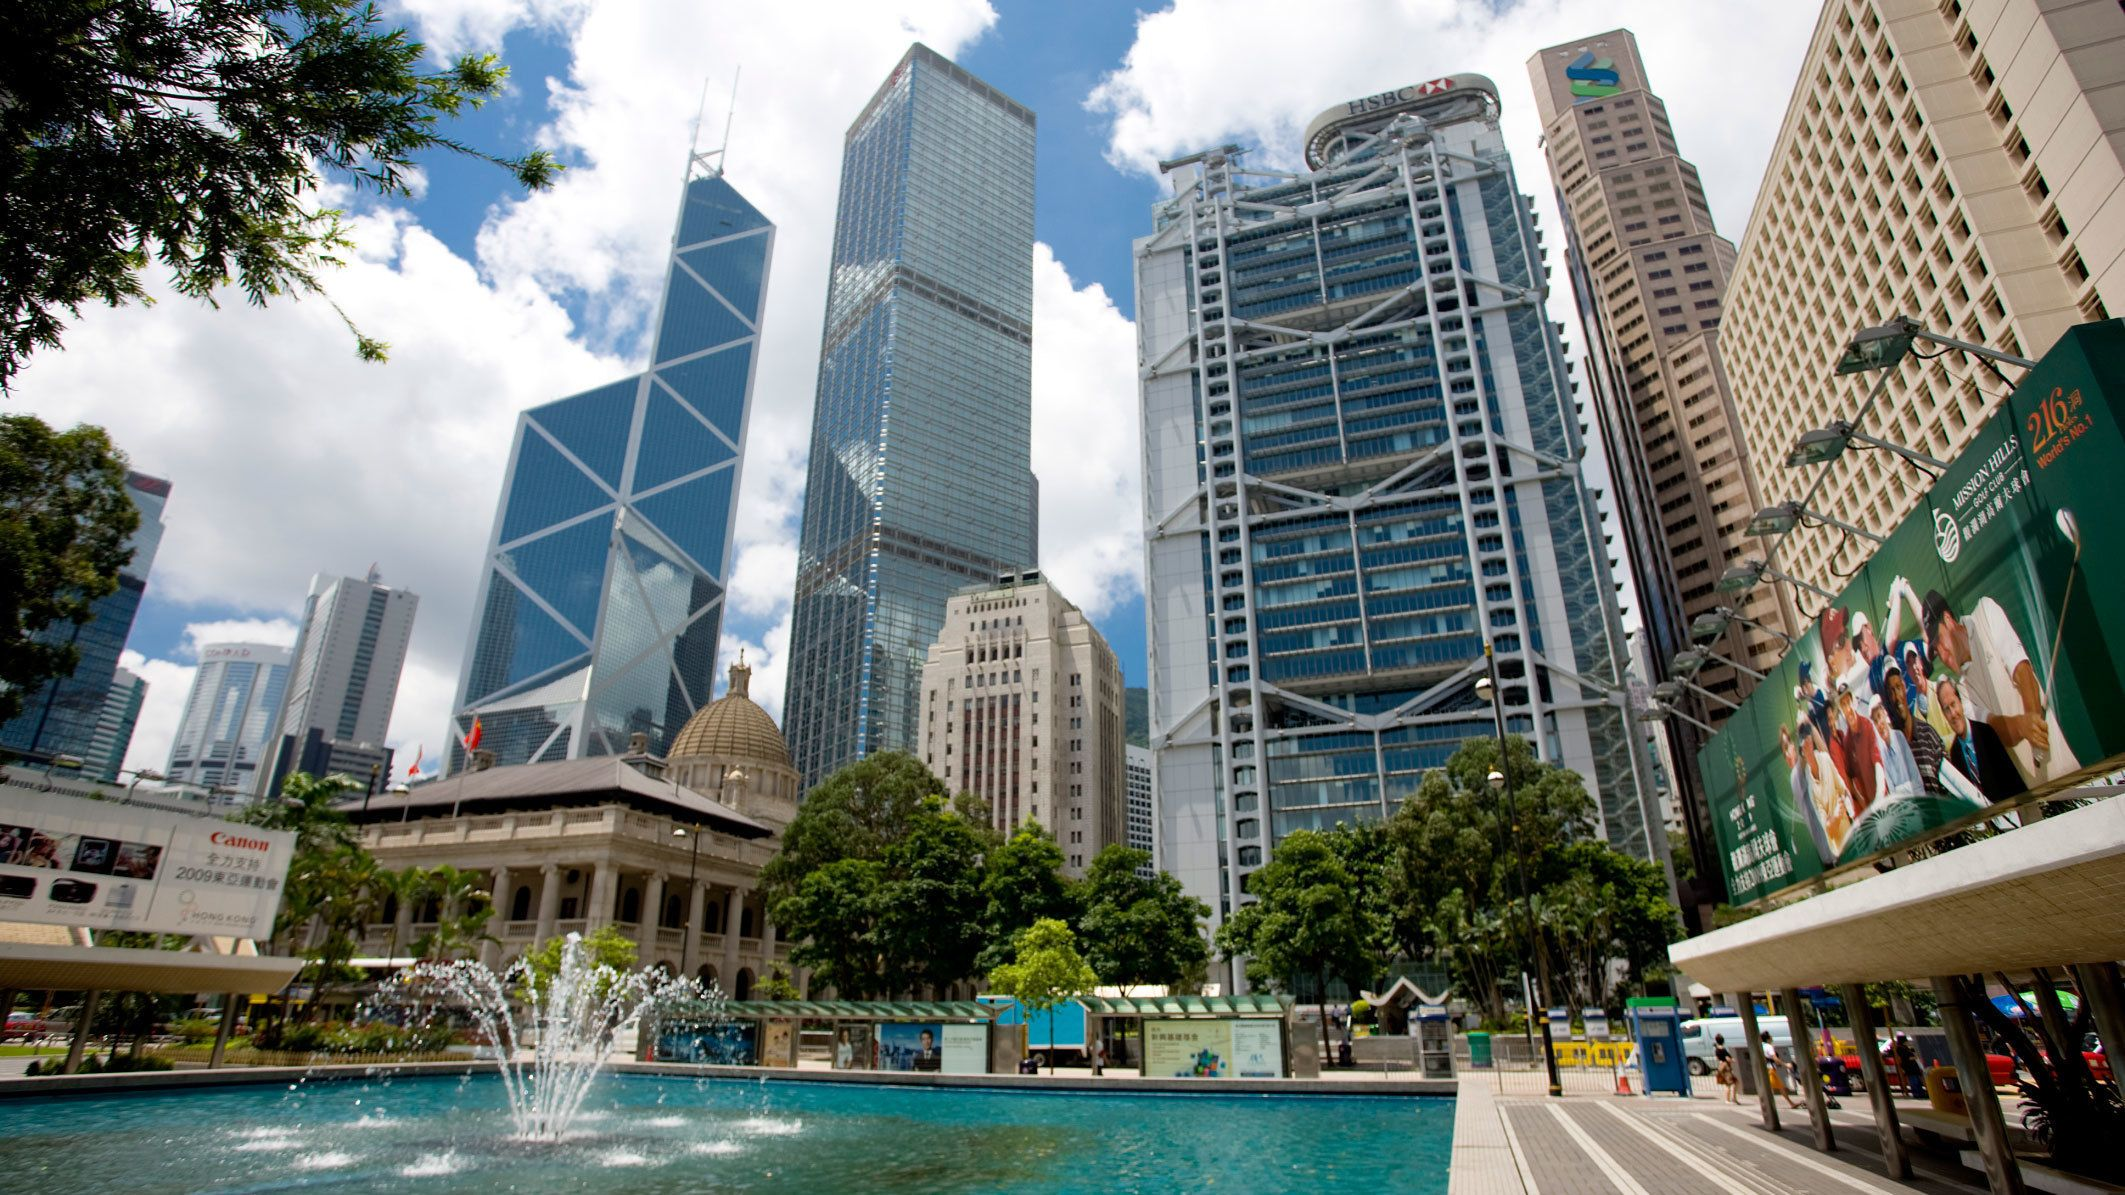 Water fountain among the high rises in Hong Kong